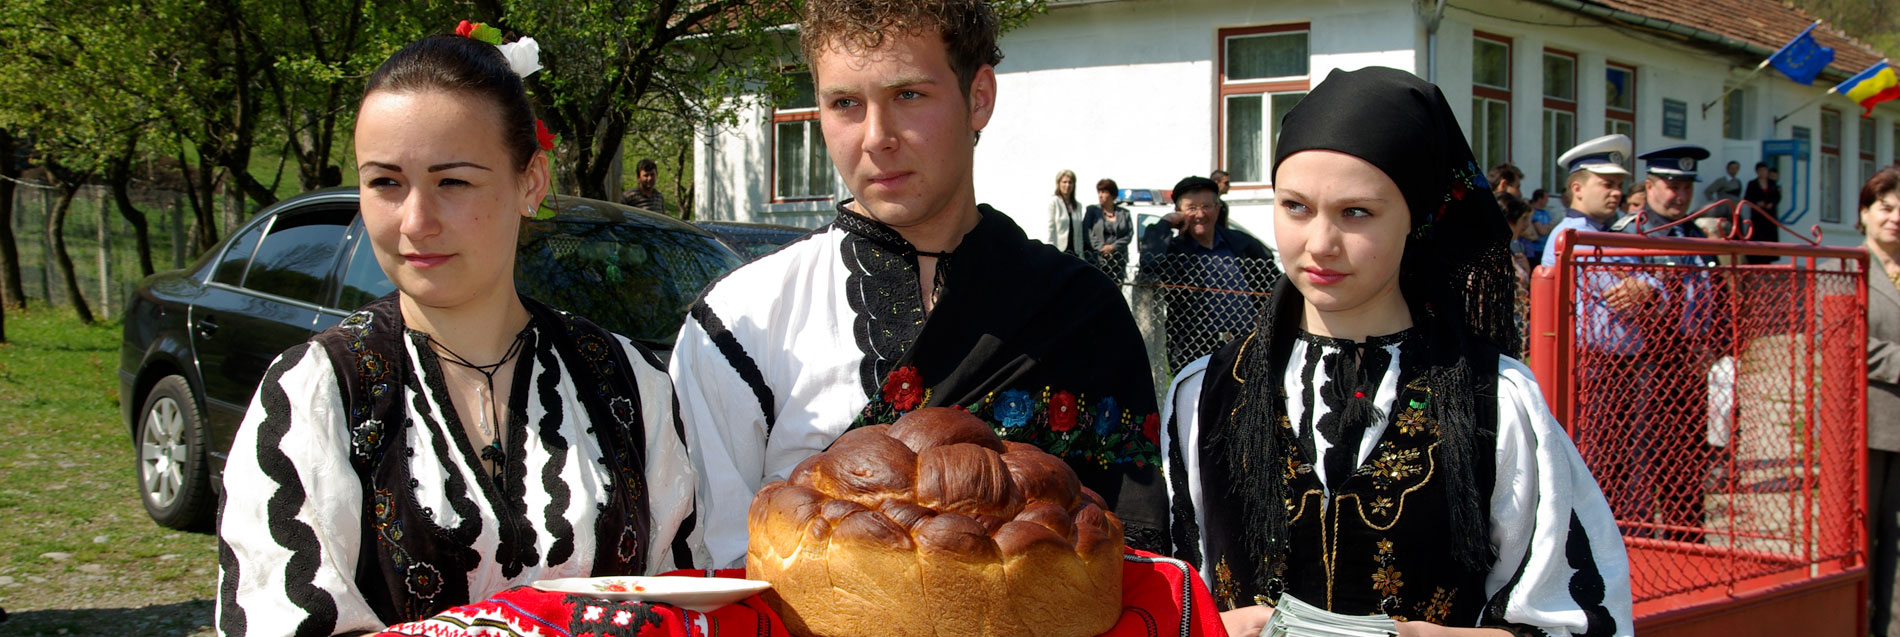 La culture roumaine.